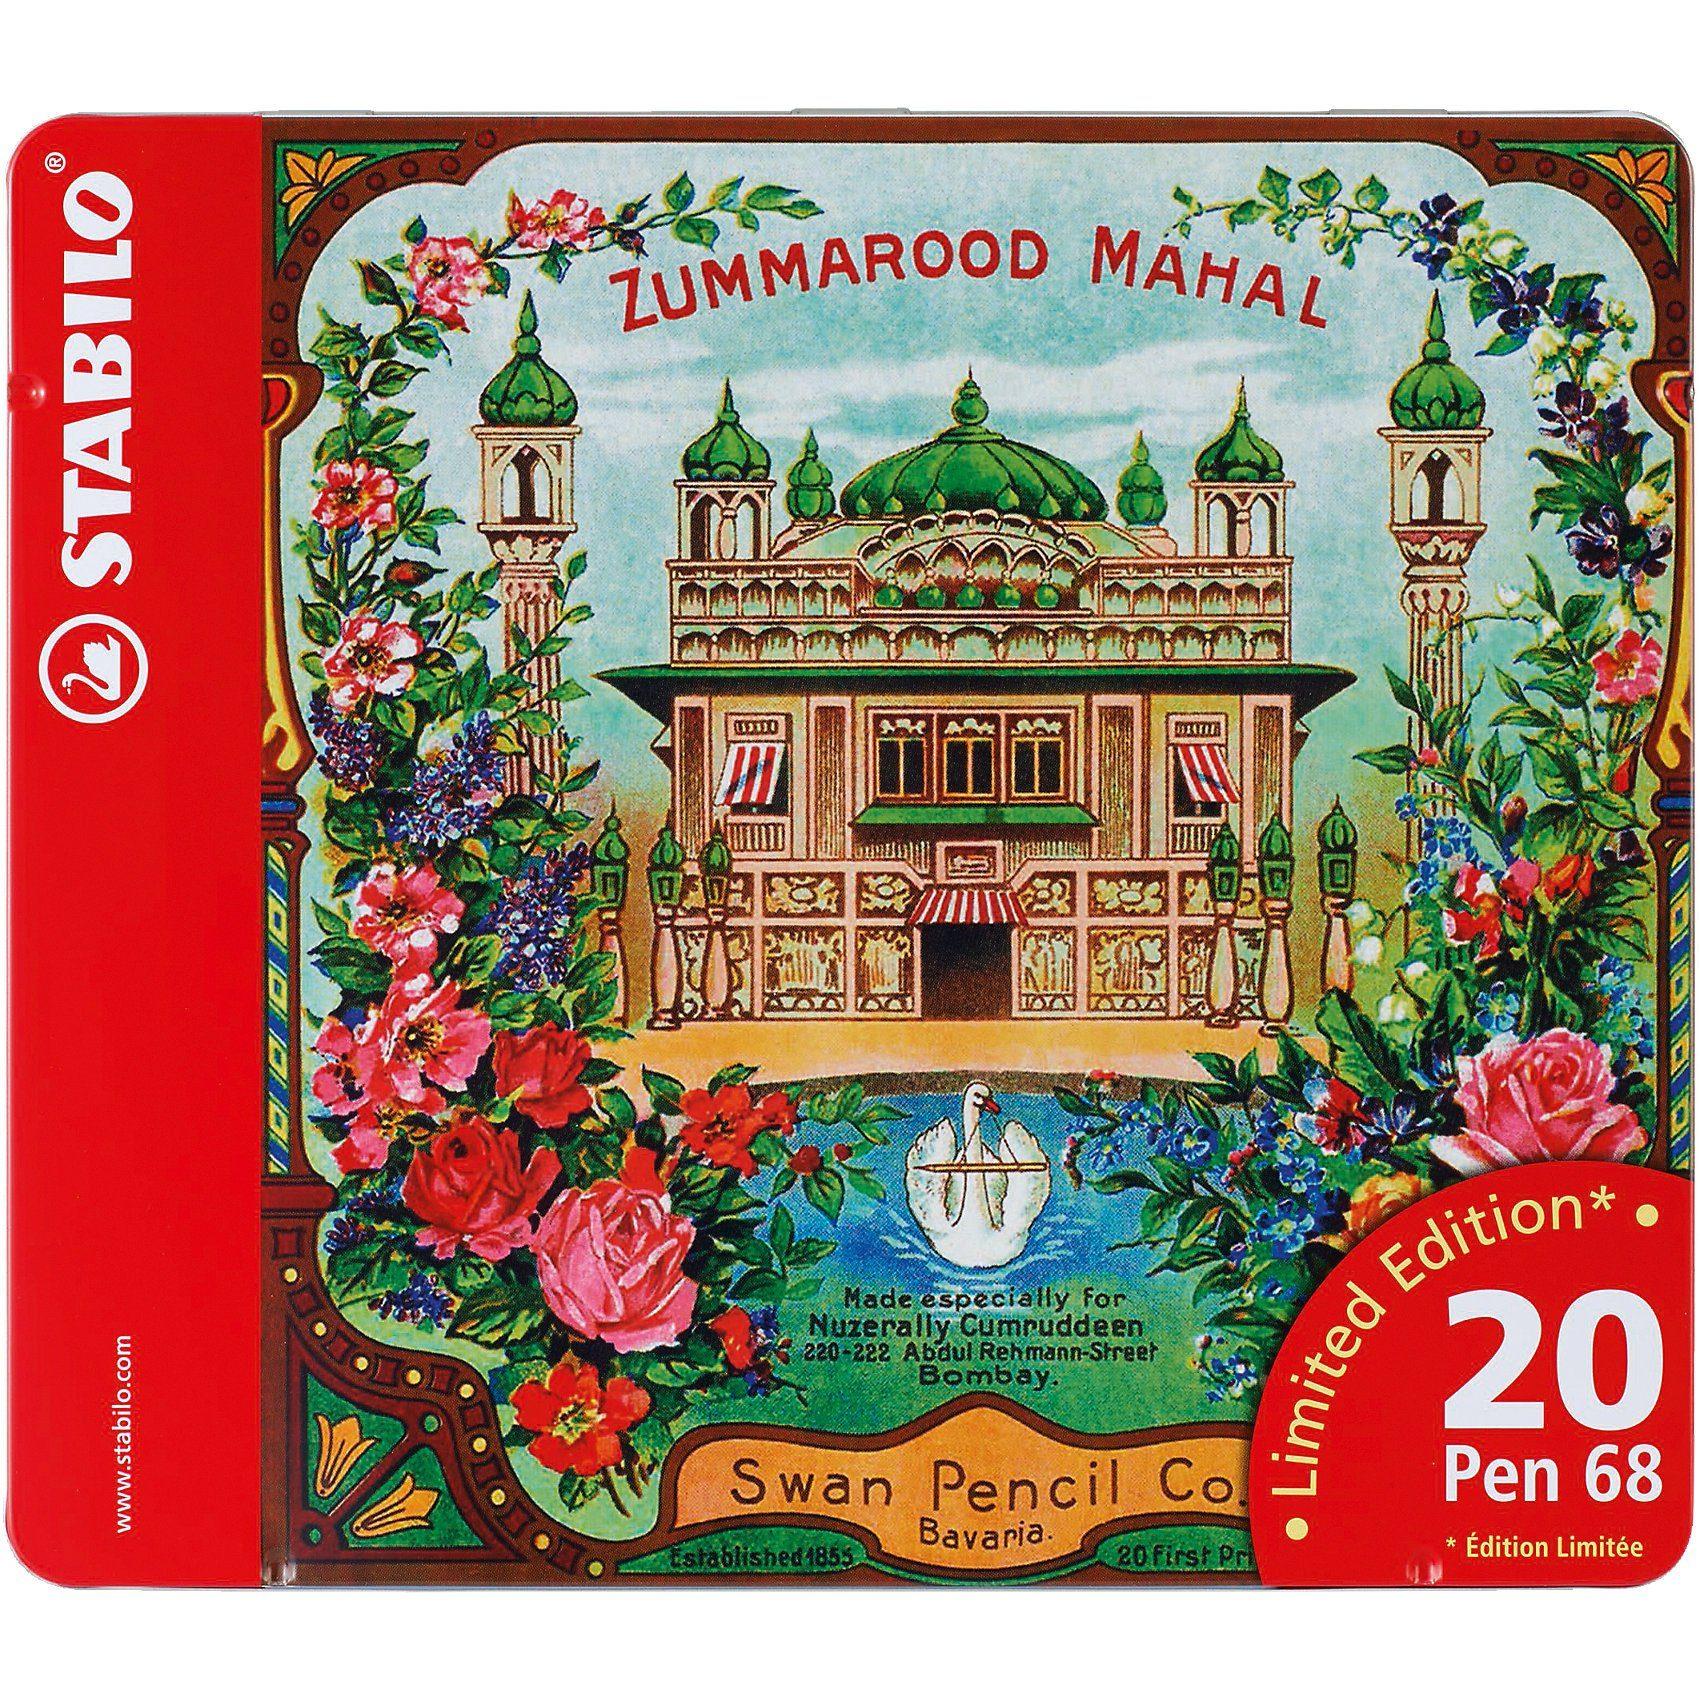 Stabilo Filzstifte Pen 68 Zummarood Mahal im Metalletui limited Edit